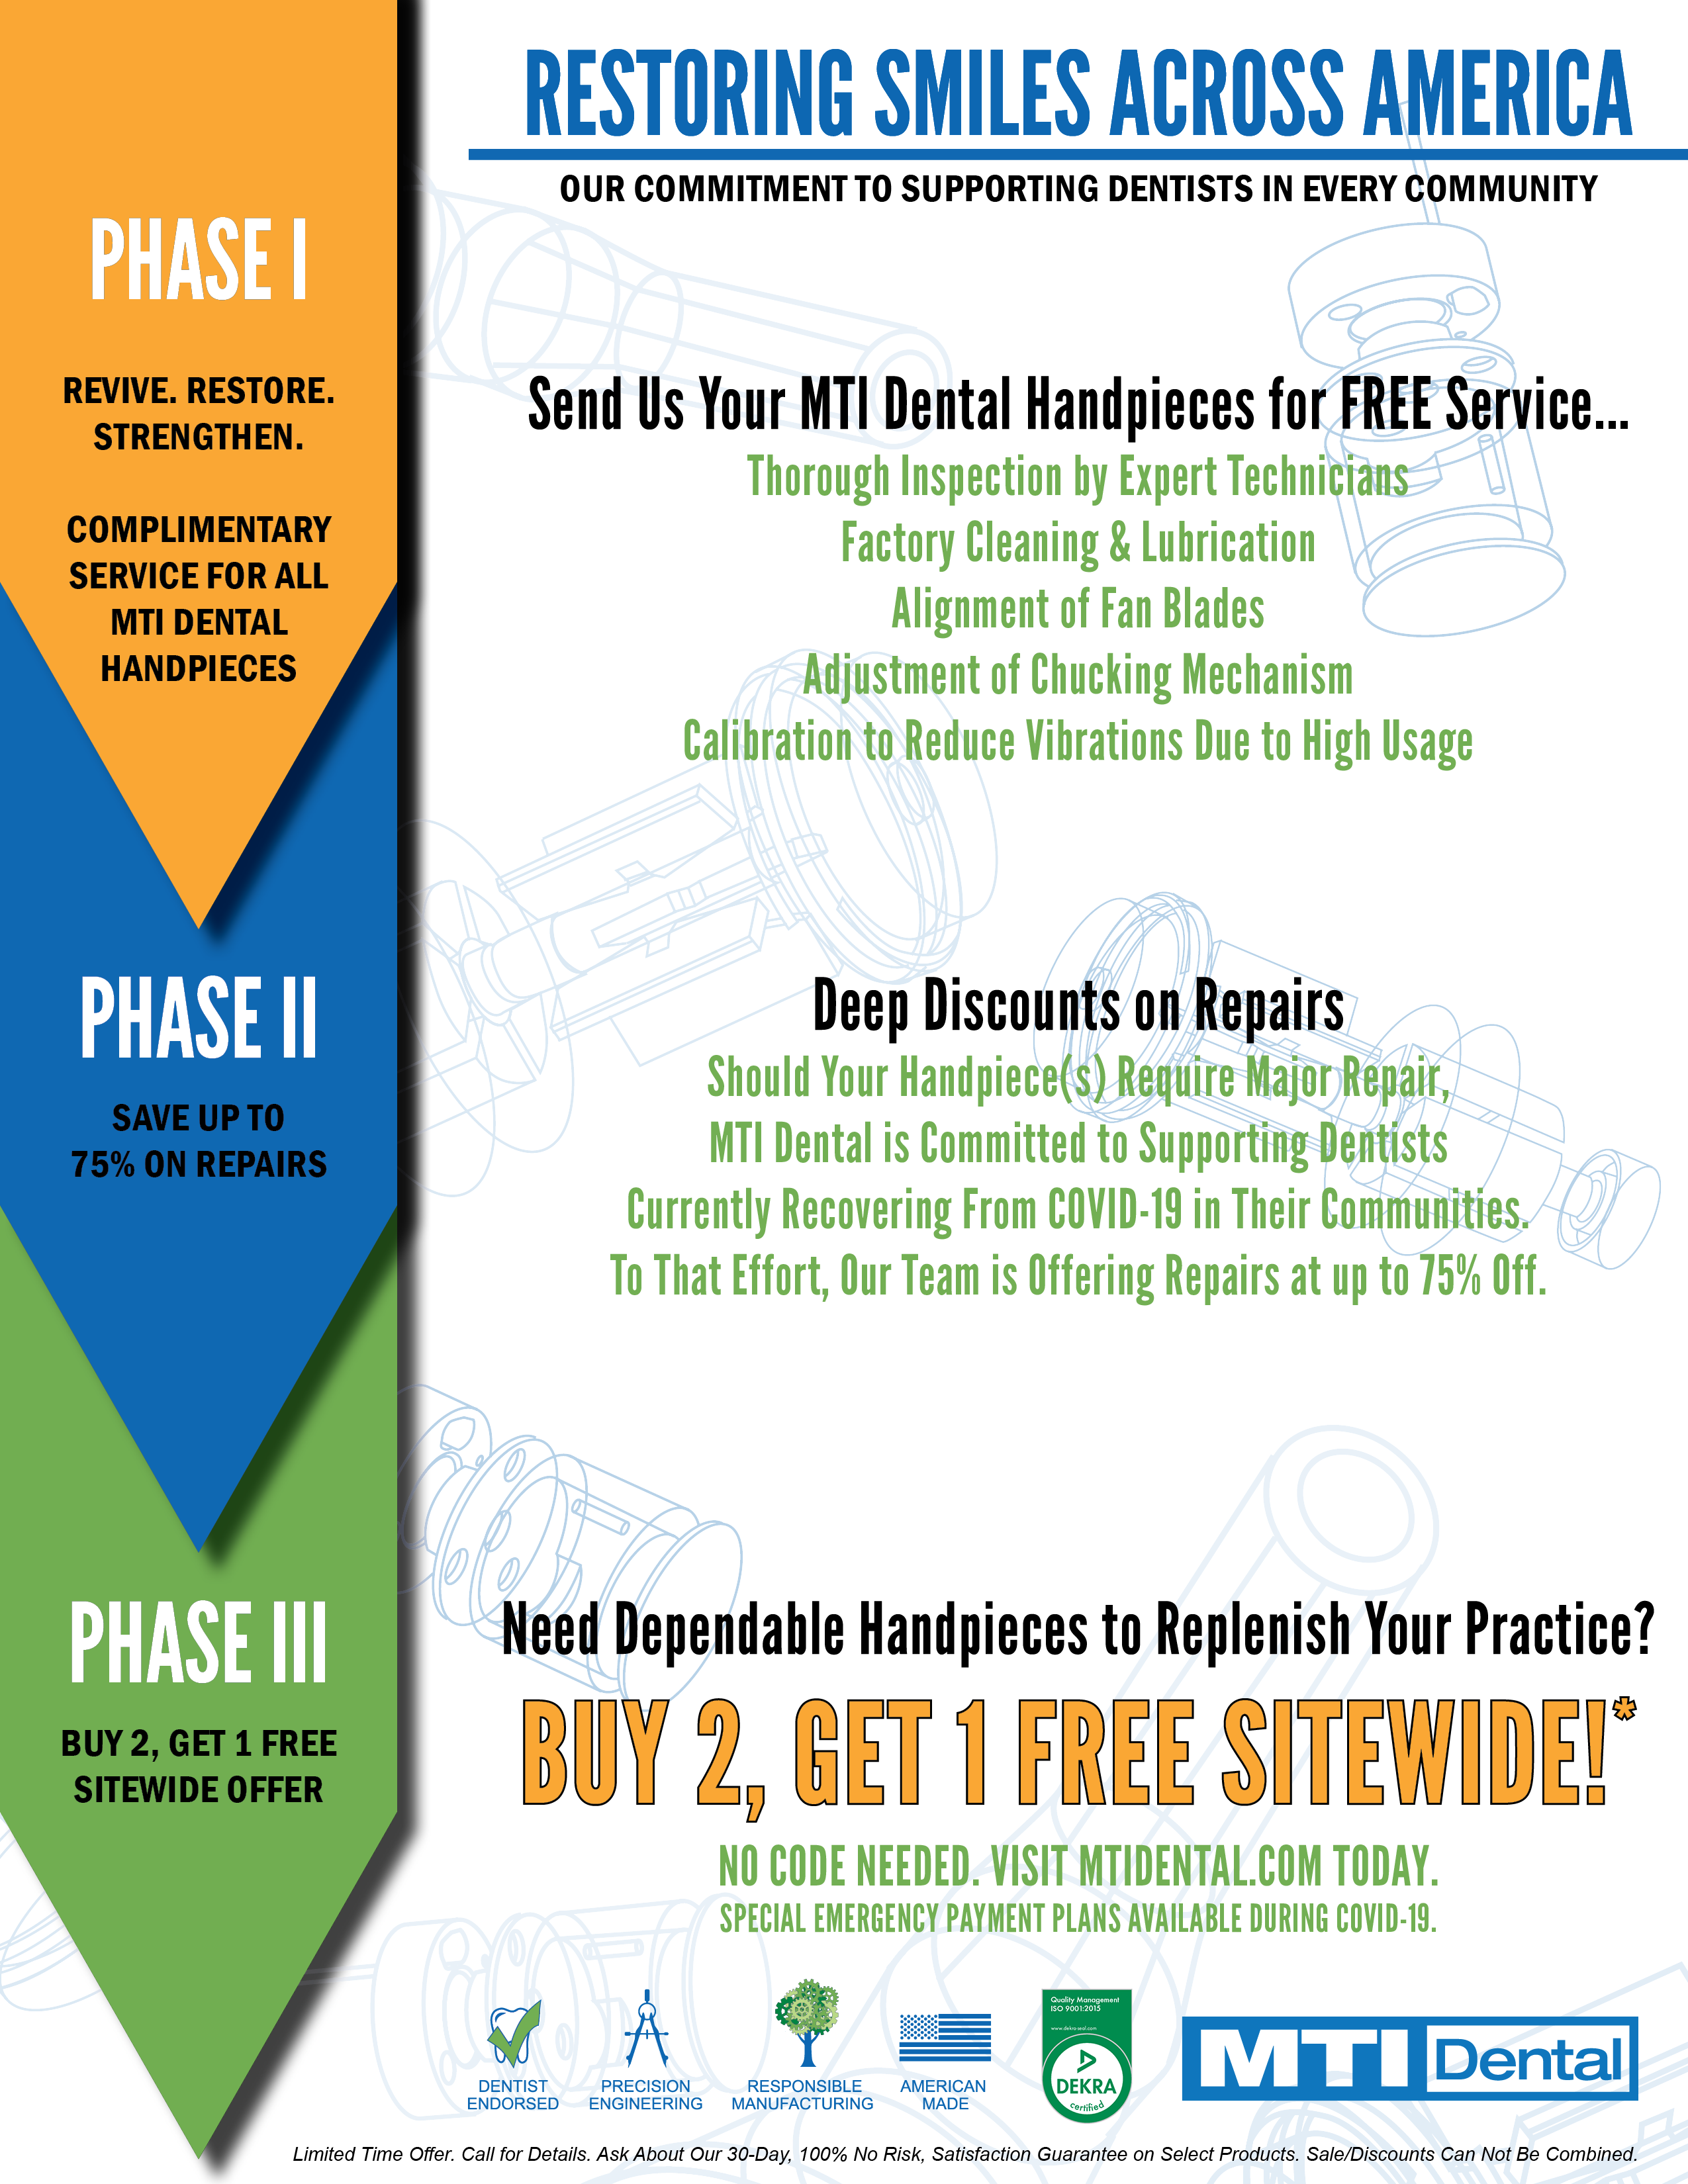 MTI Dental Restoring Smiles Across America, Buy 2 Get 1 Free Sitewide Sale